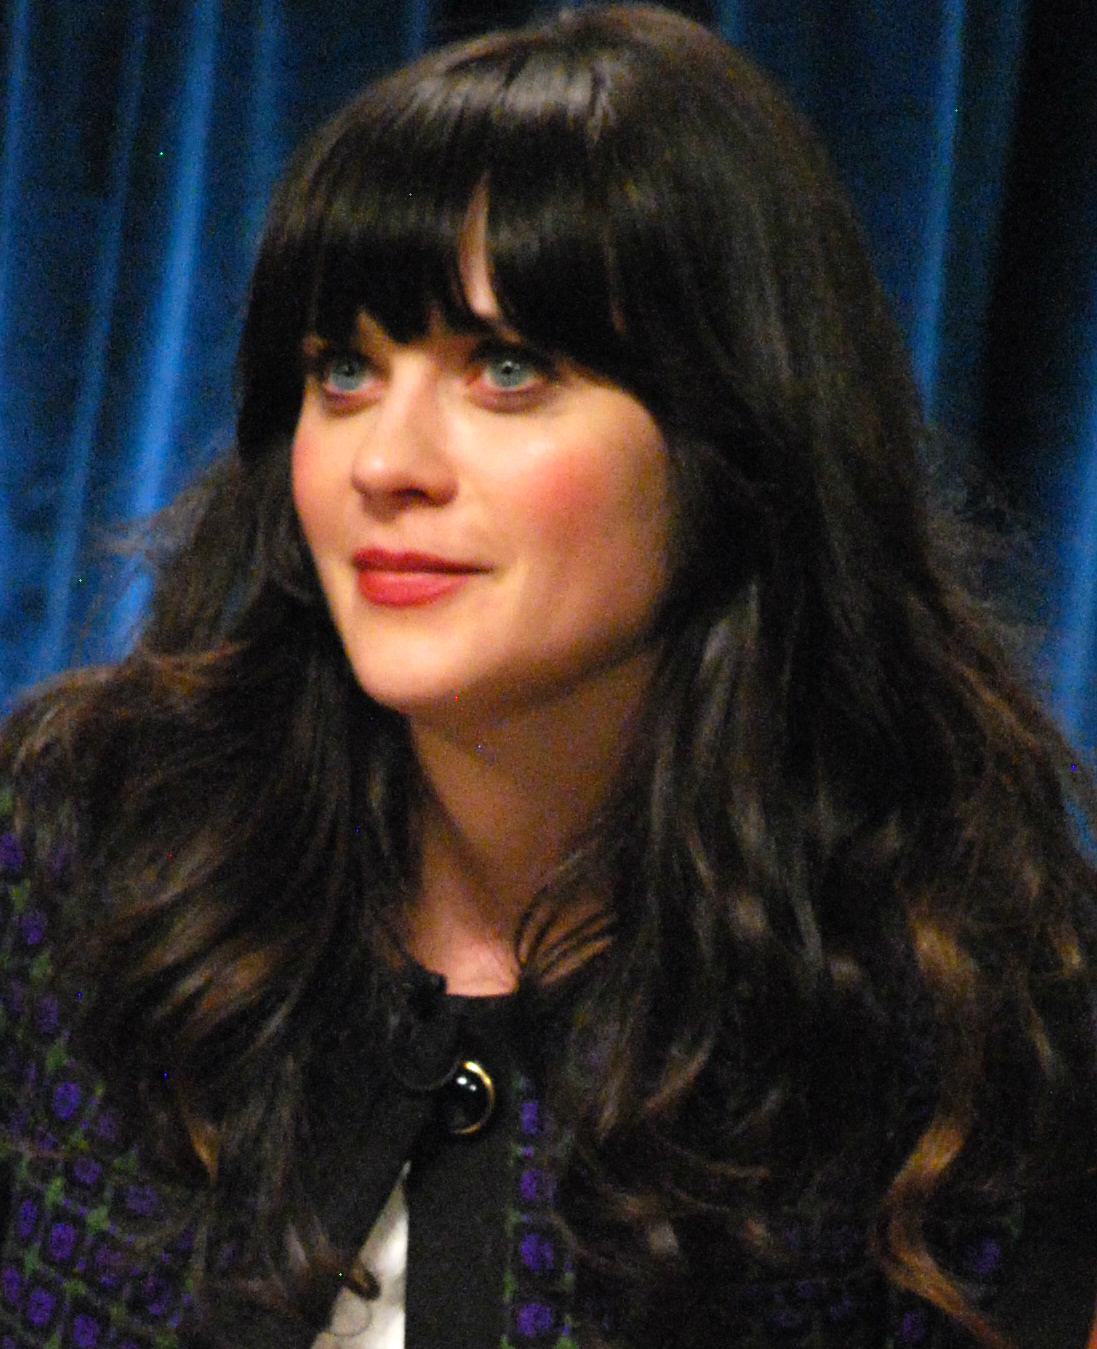 Jessica Day (New Girl) - Wikipedia